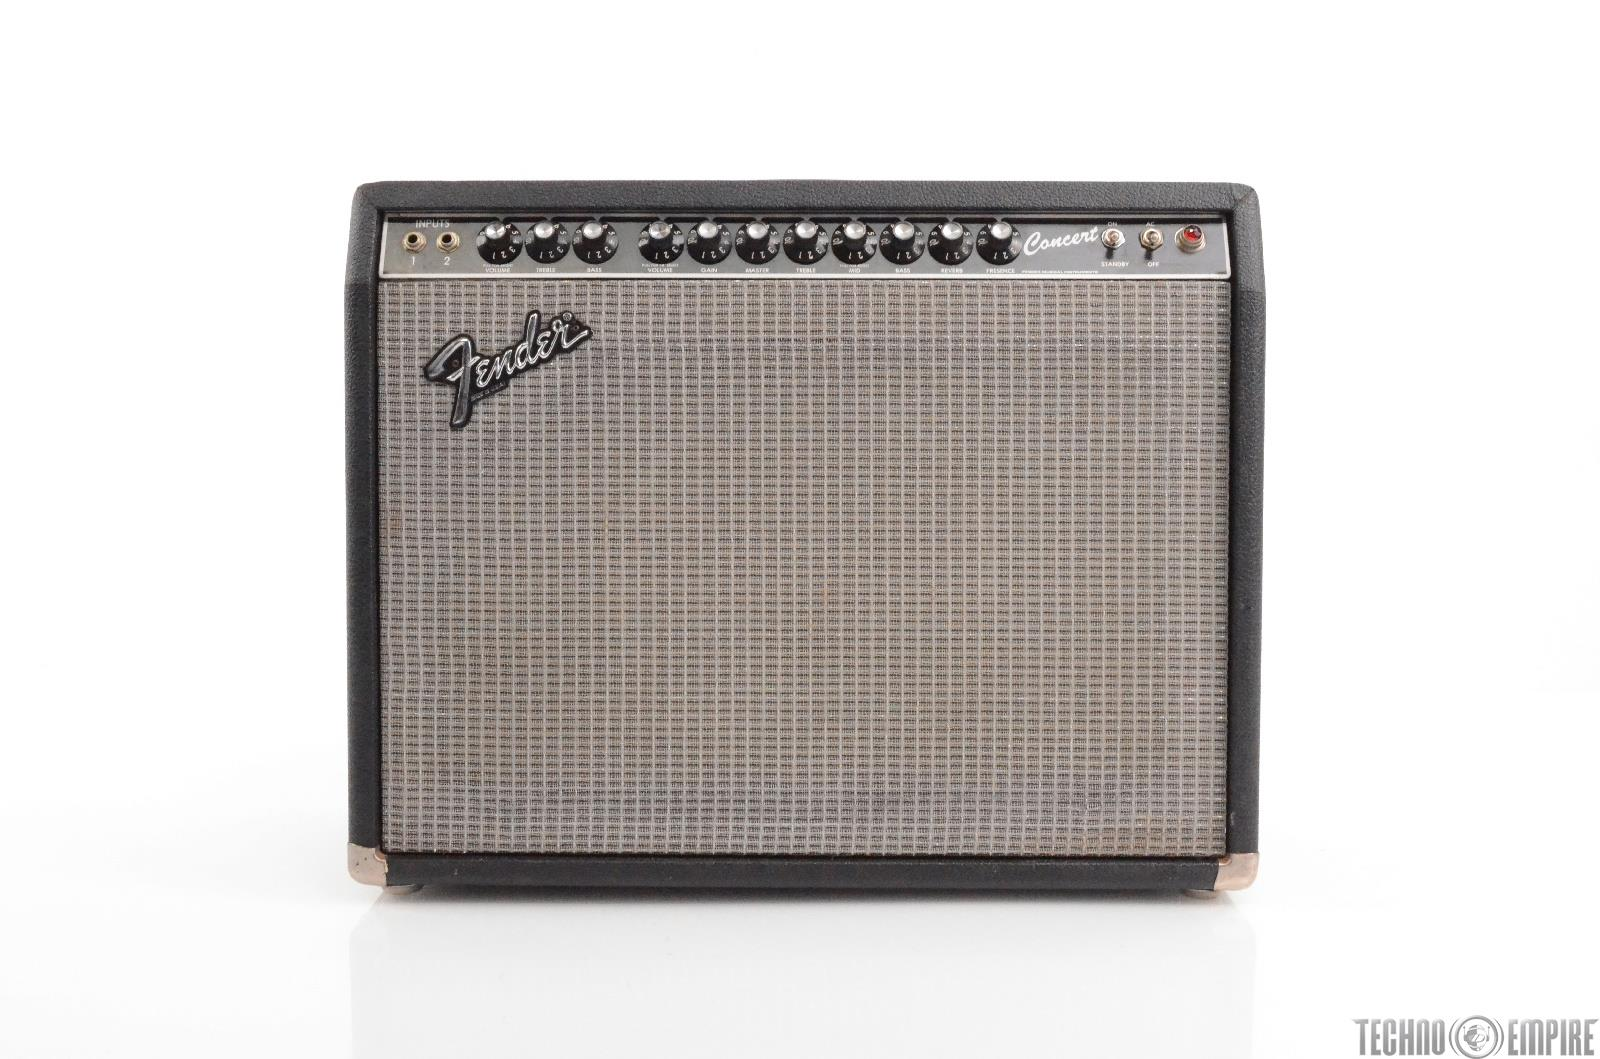 1980's Fender Concert Amp 1x12 Tube Guitar Amp Paul Barrere Little Feat #29317